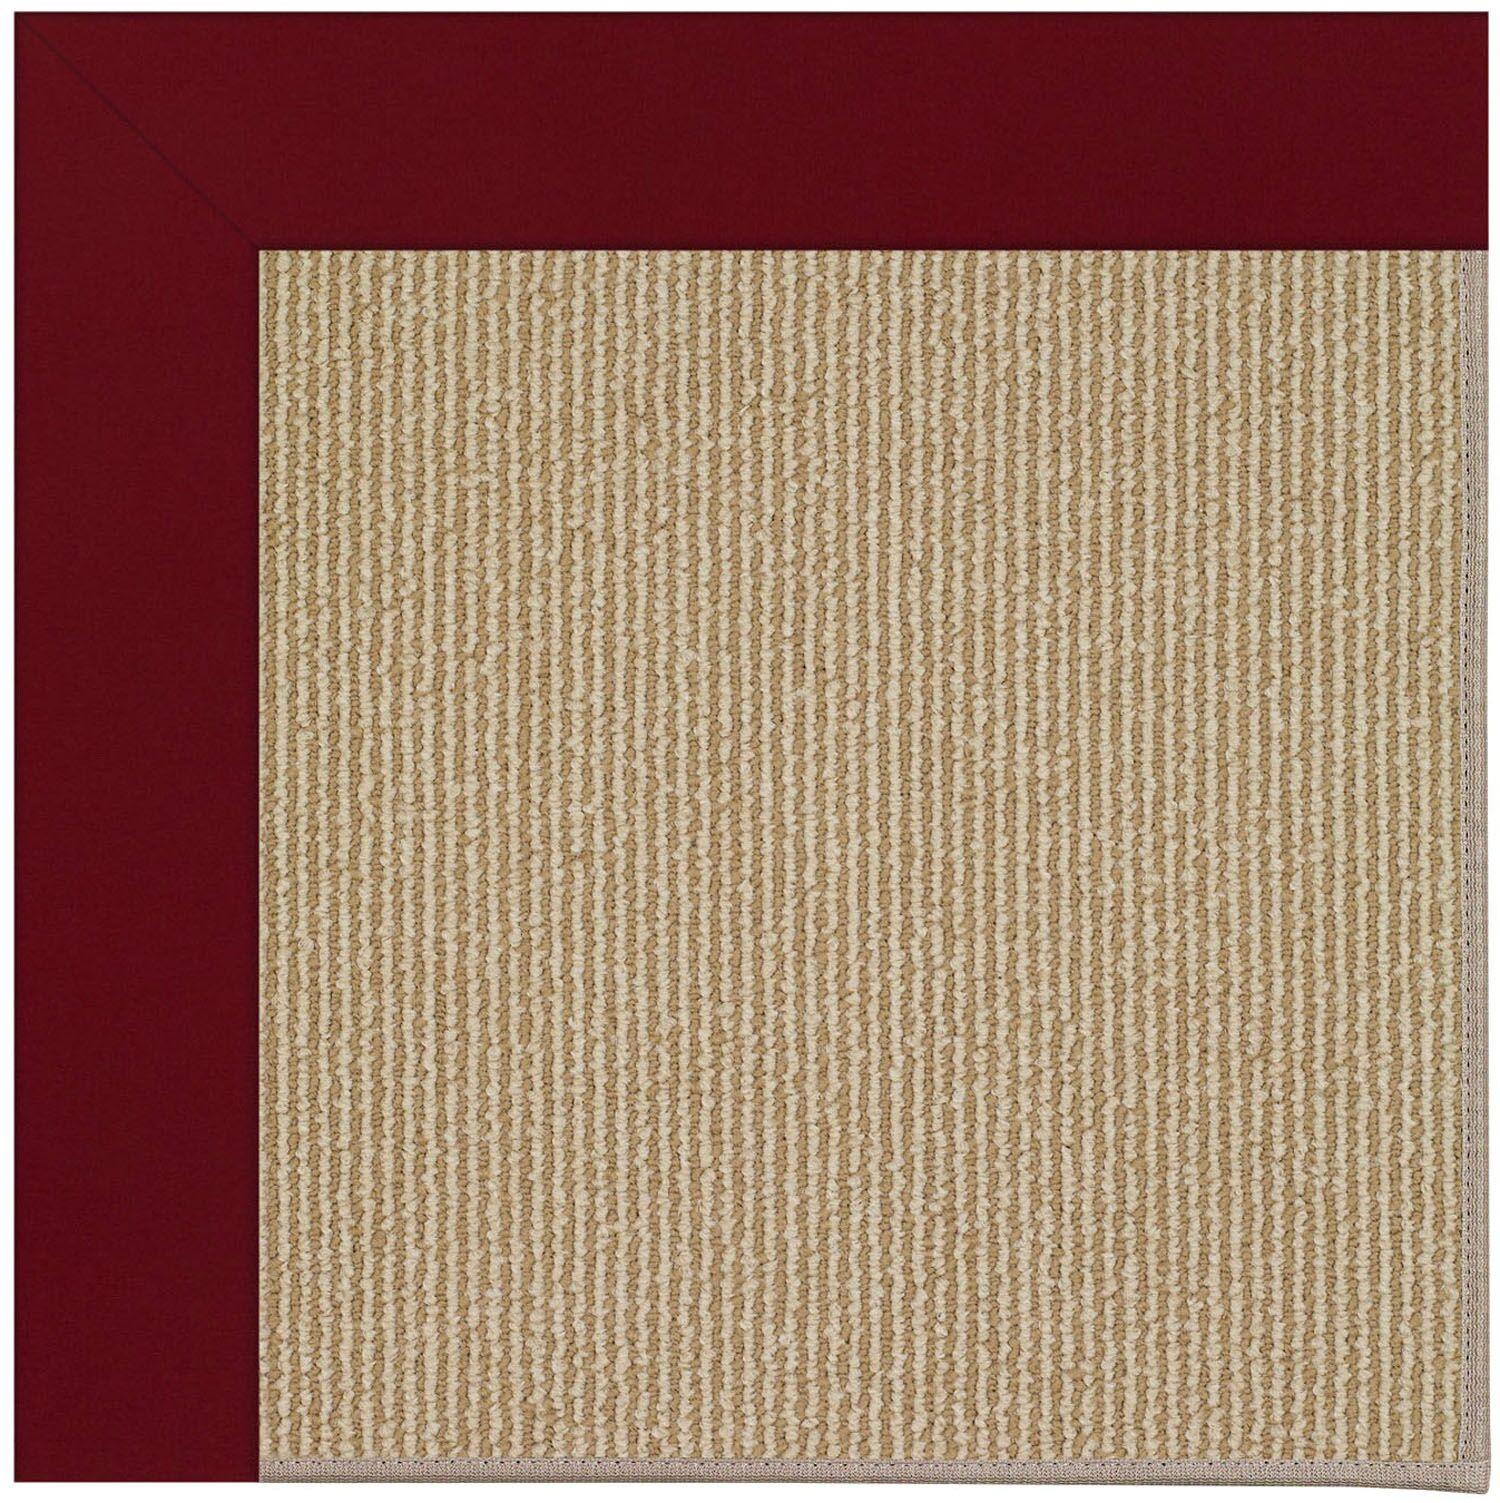 Lisle Brown Indoor/Outdoor Area Rug Rug Size: Rectangle 8' x 10'